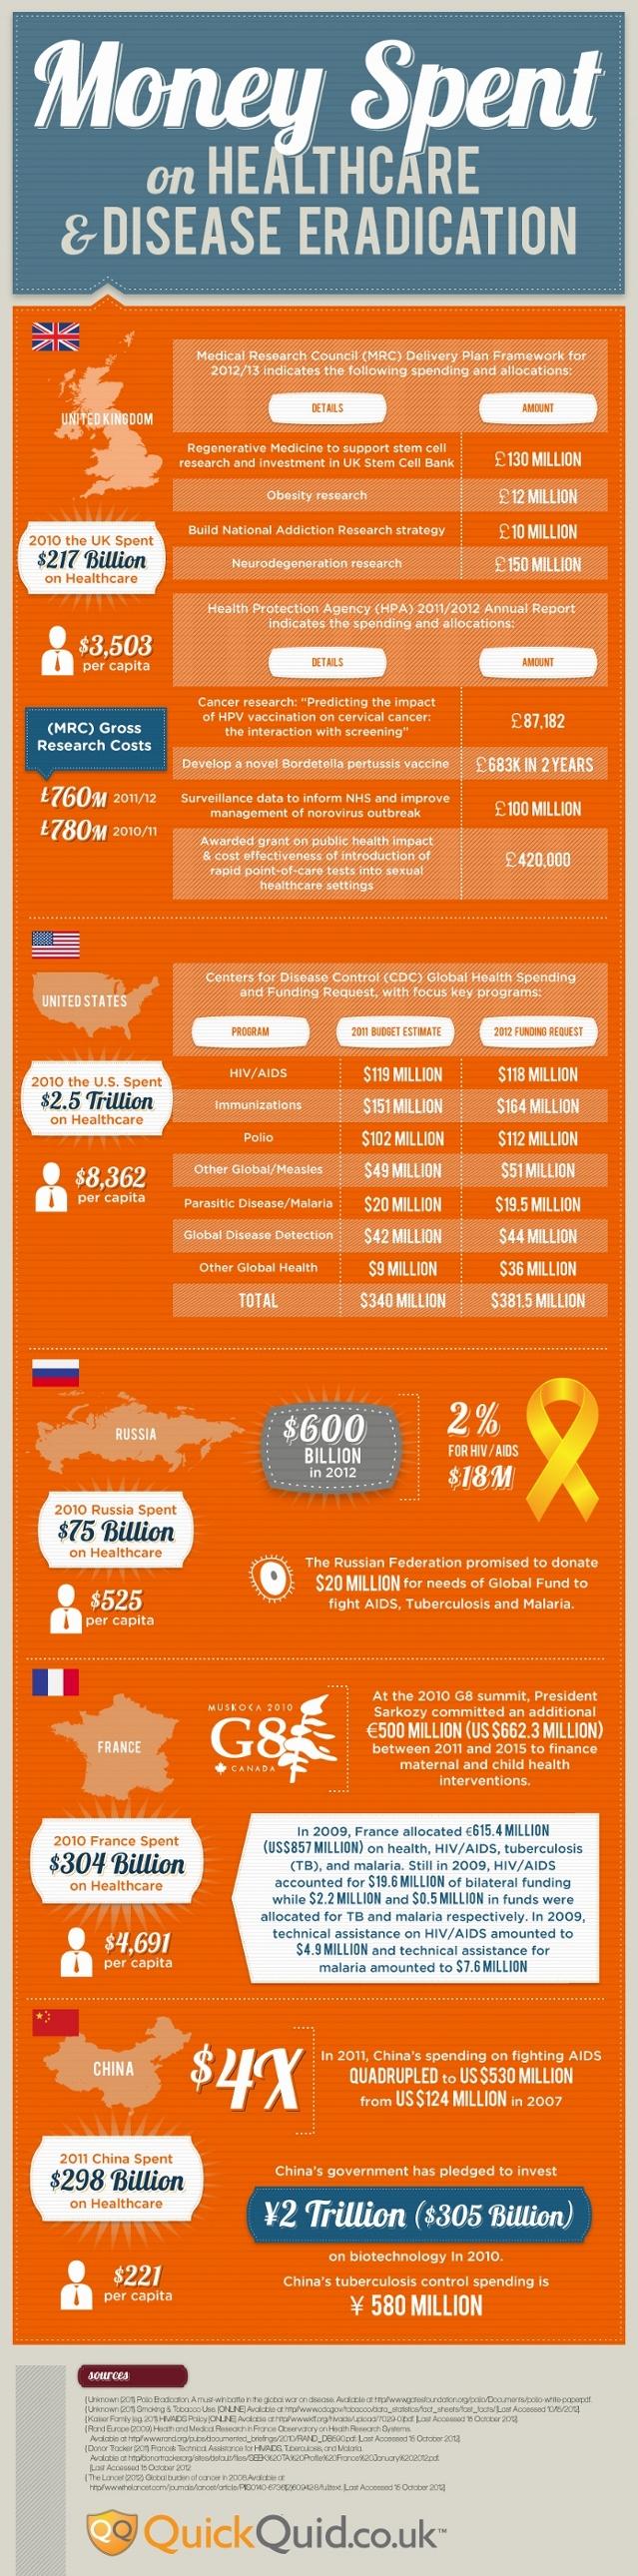 Money Spent on Healthcare & Disease Eradication